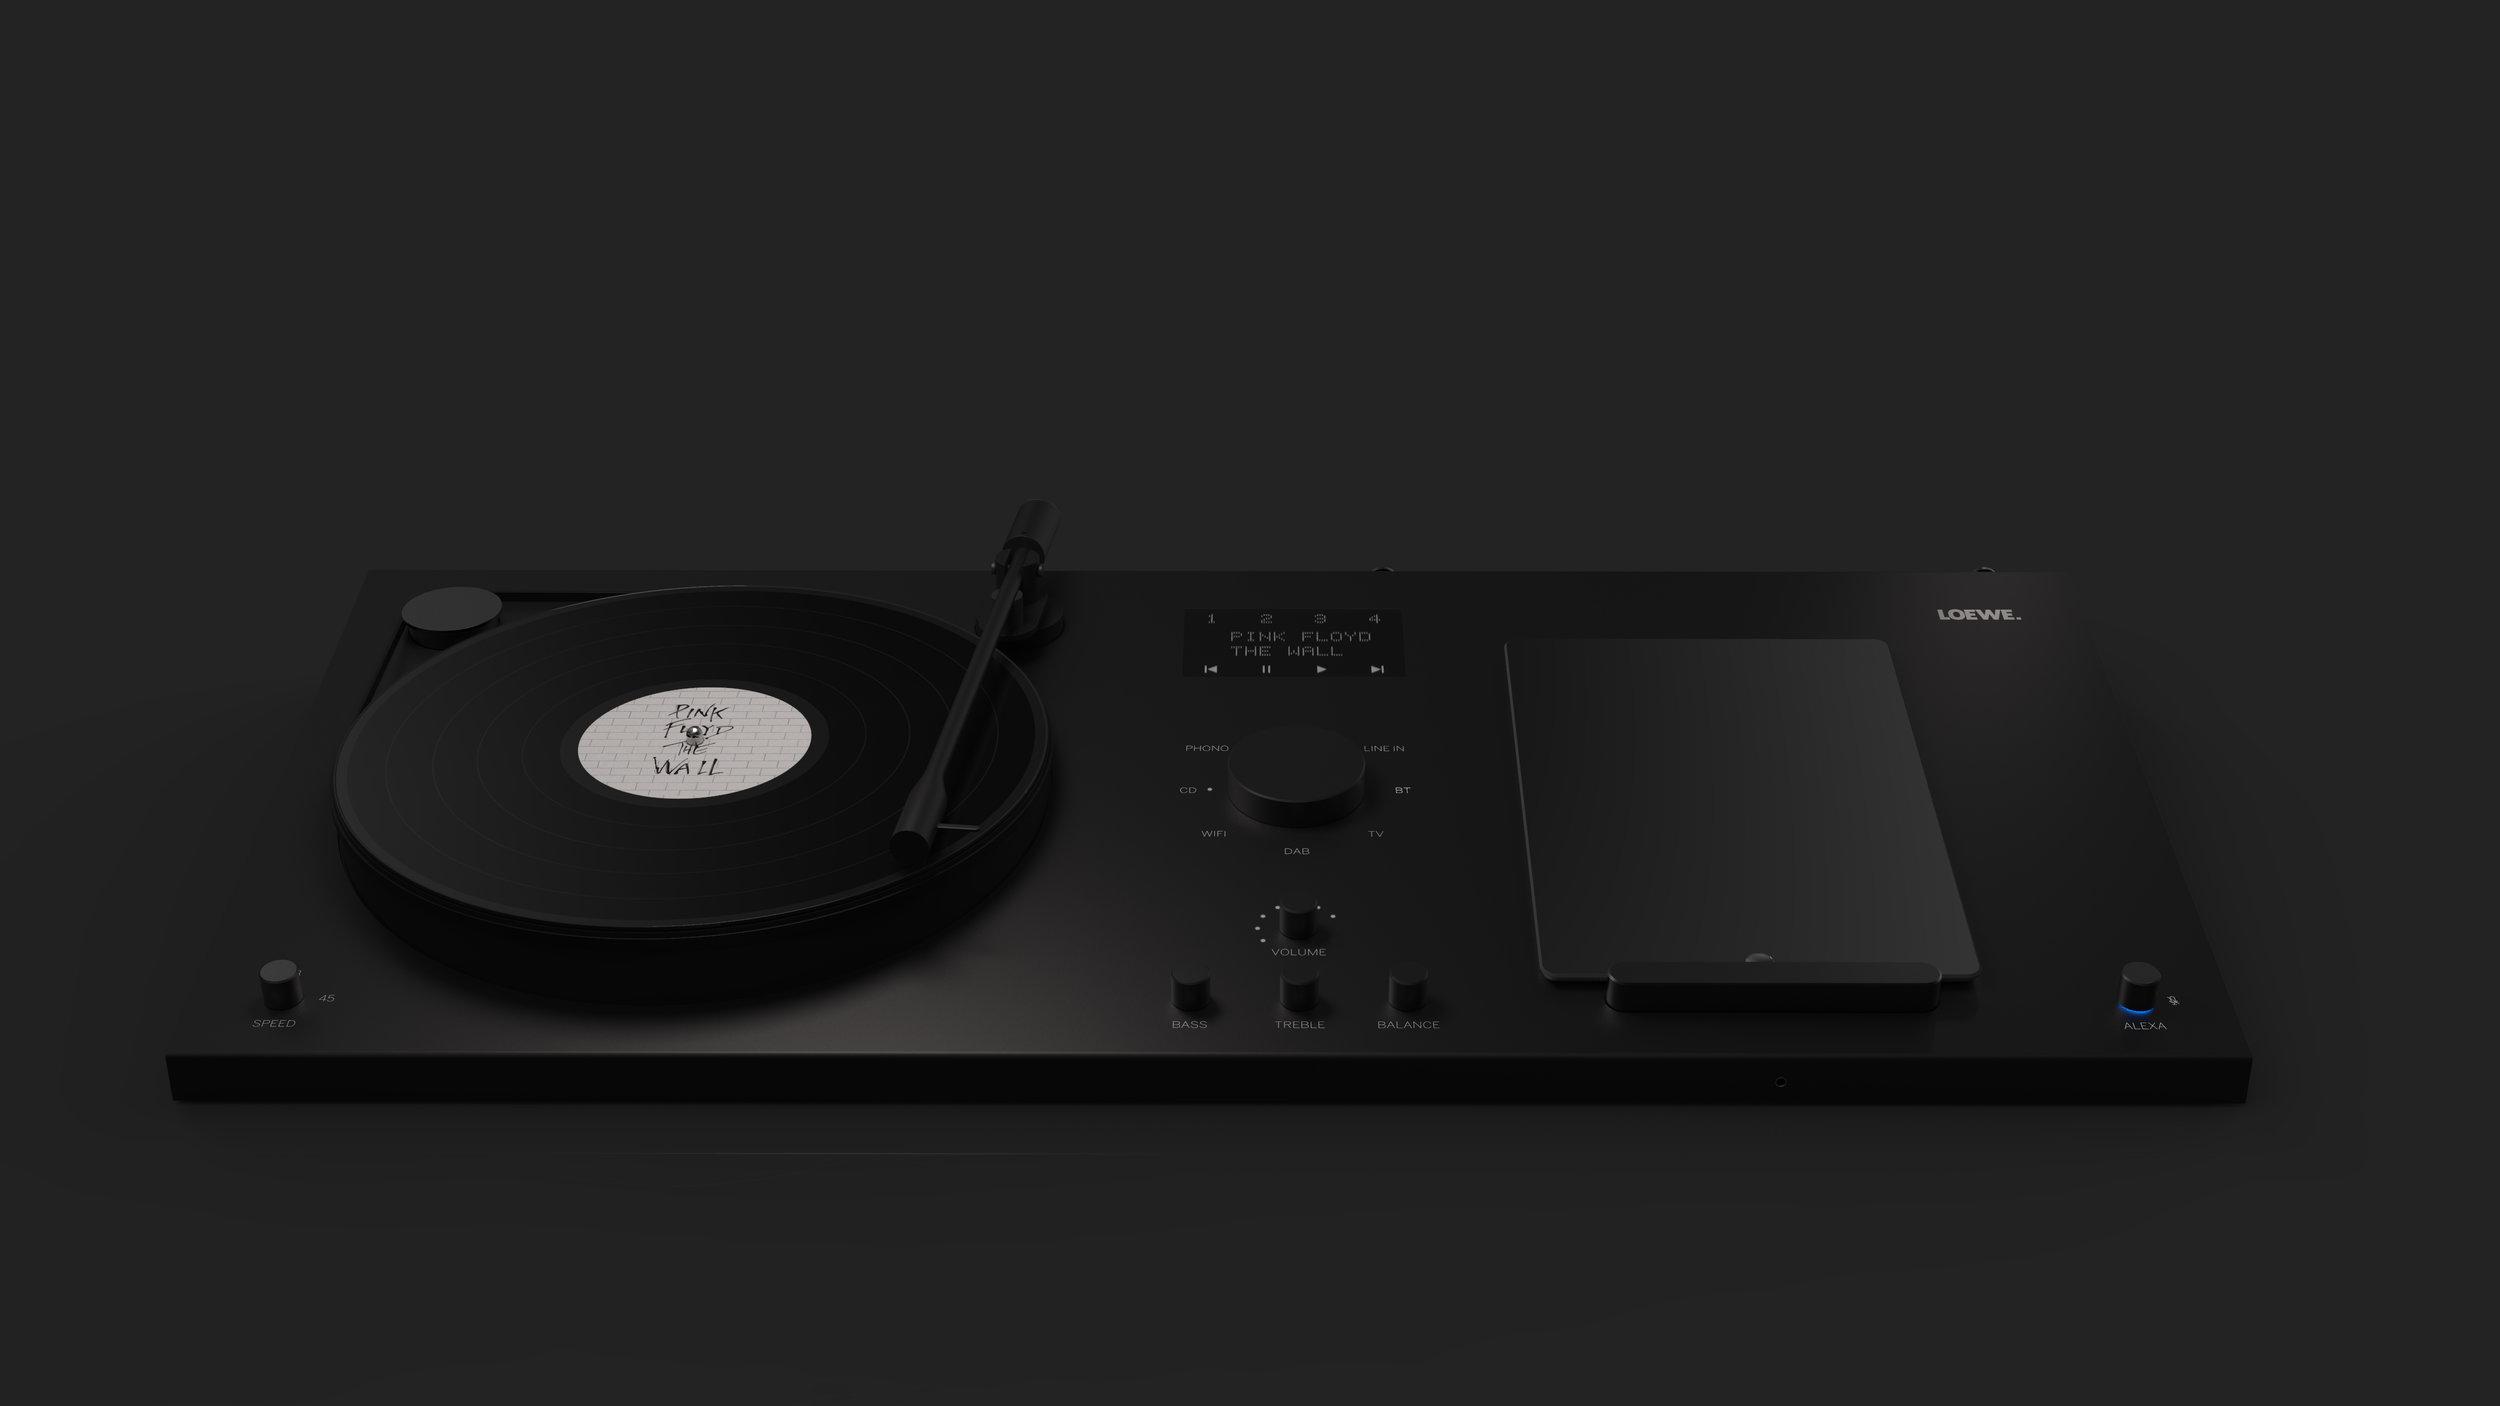 soundbox_front.jpg